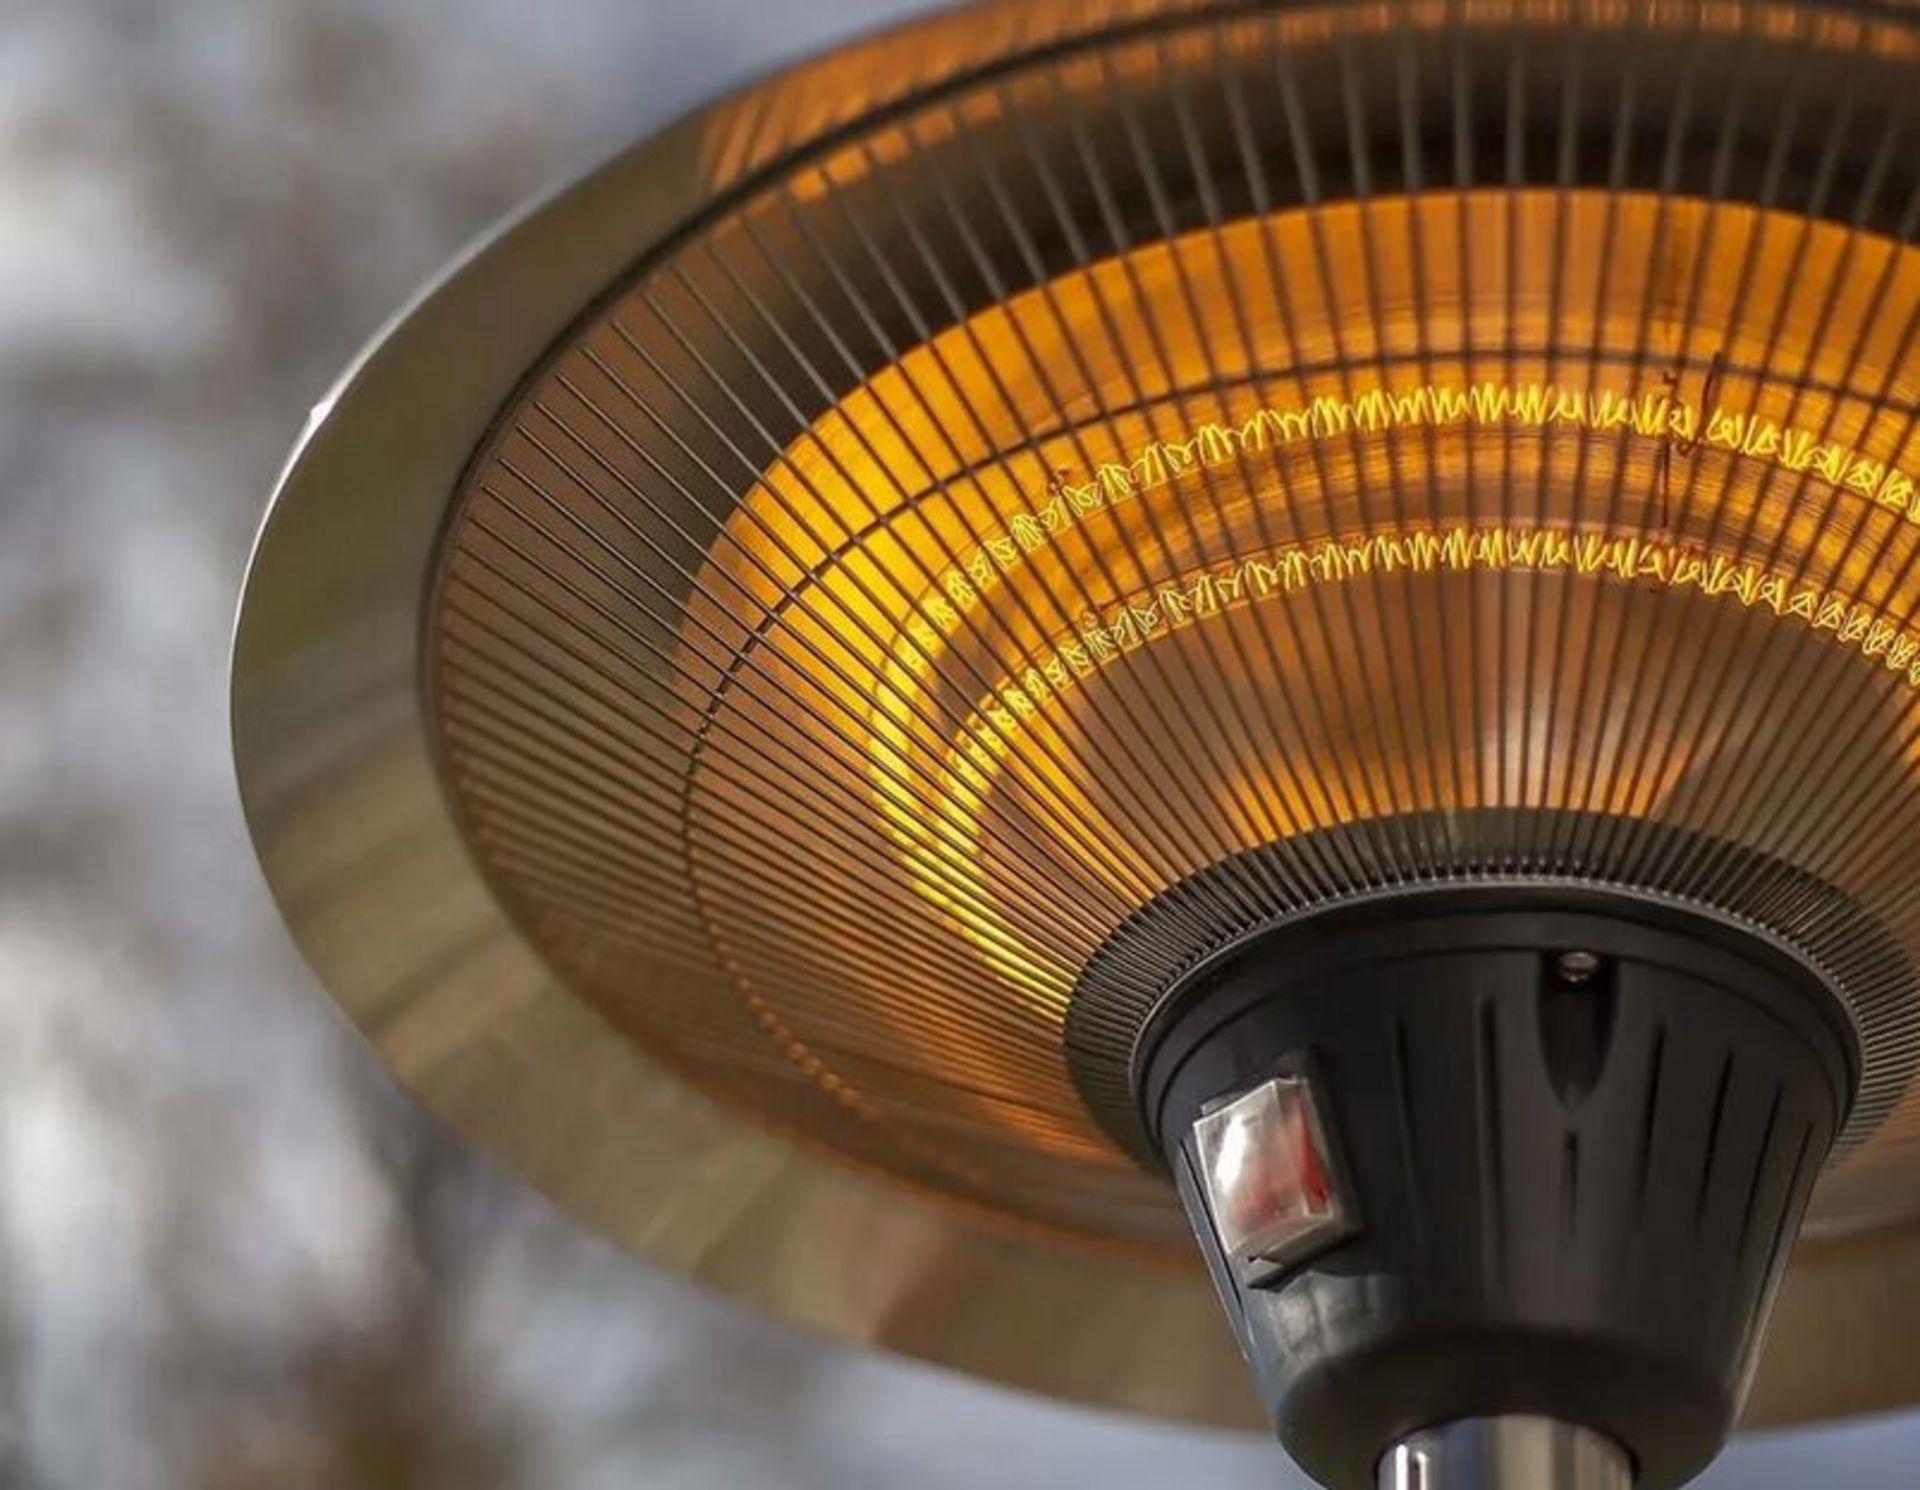 (P6) 1x La Hacienda Lume Standing Heater RRP £99.99 3 Heater Settings: 900W, 1200W & 2100W (H205x - Image 2 of 4